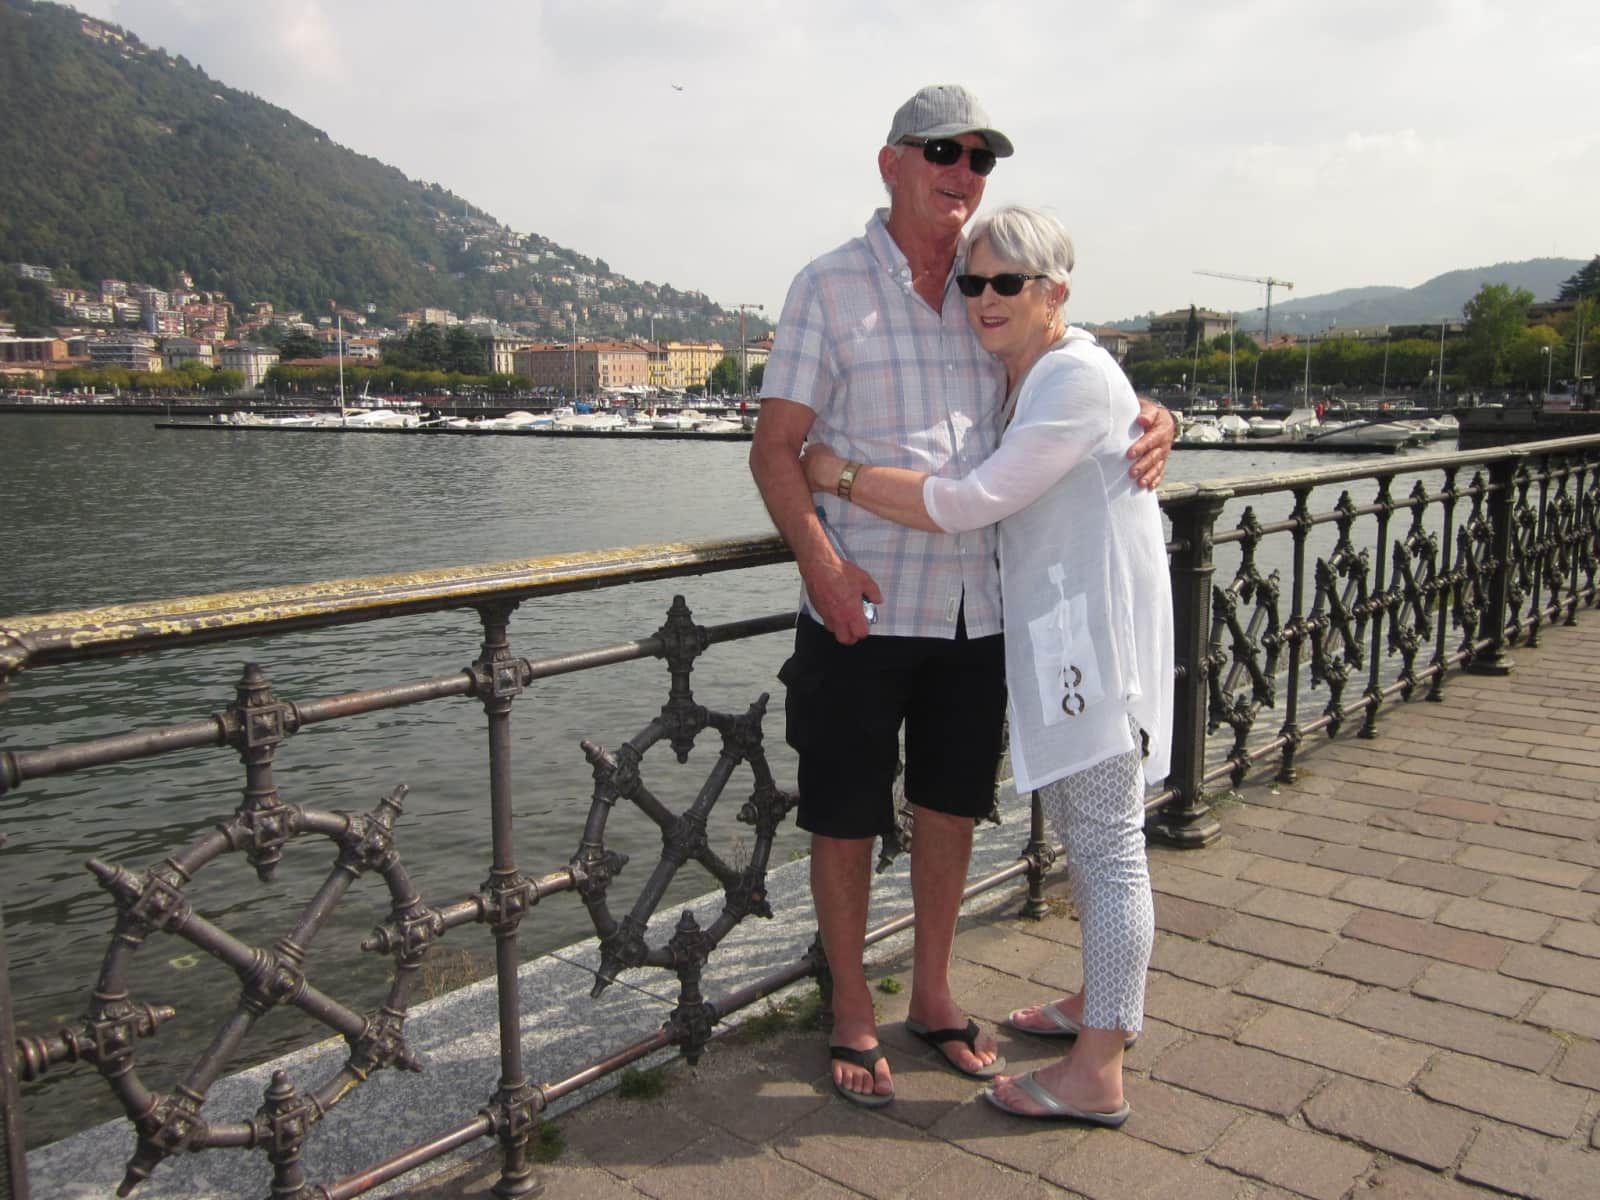 Estelle & John from Perth, Western Australia, Australia